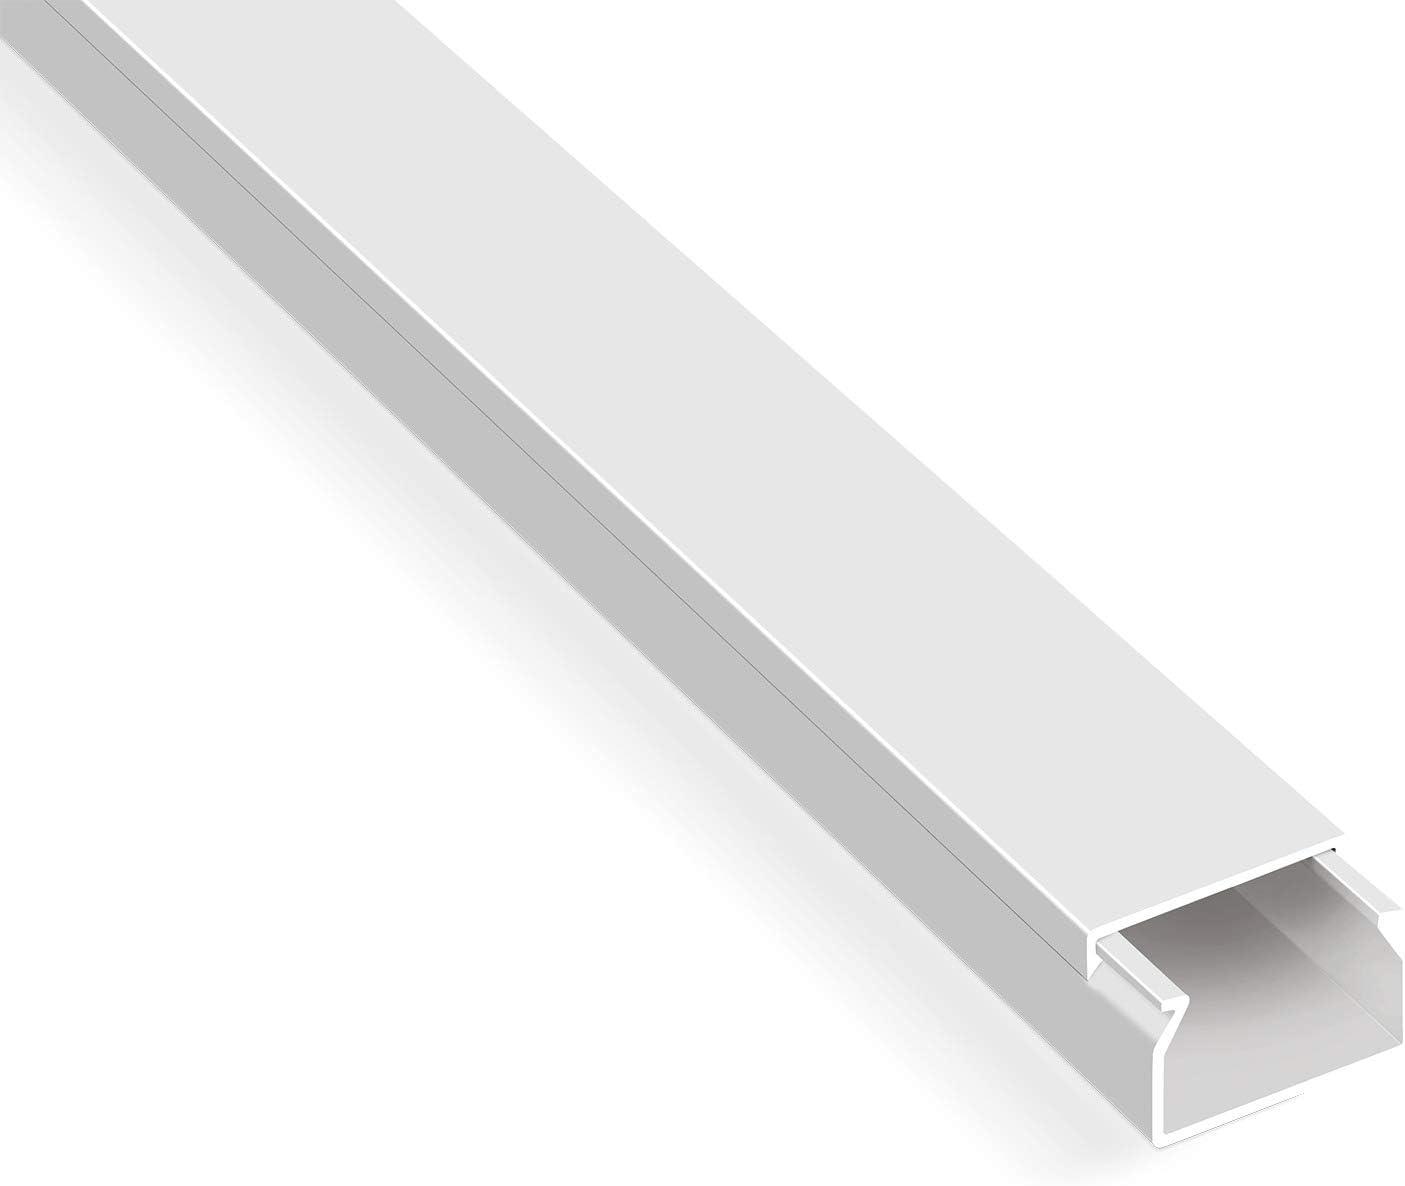 10x 100cm 16x16mm Kabelkanal Kabelleiste Kabel Kanal PVC Schwarz Selbstklebend